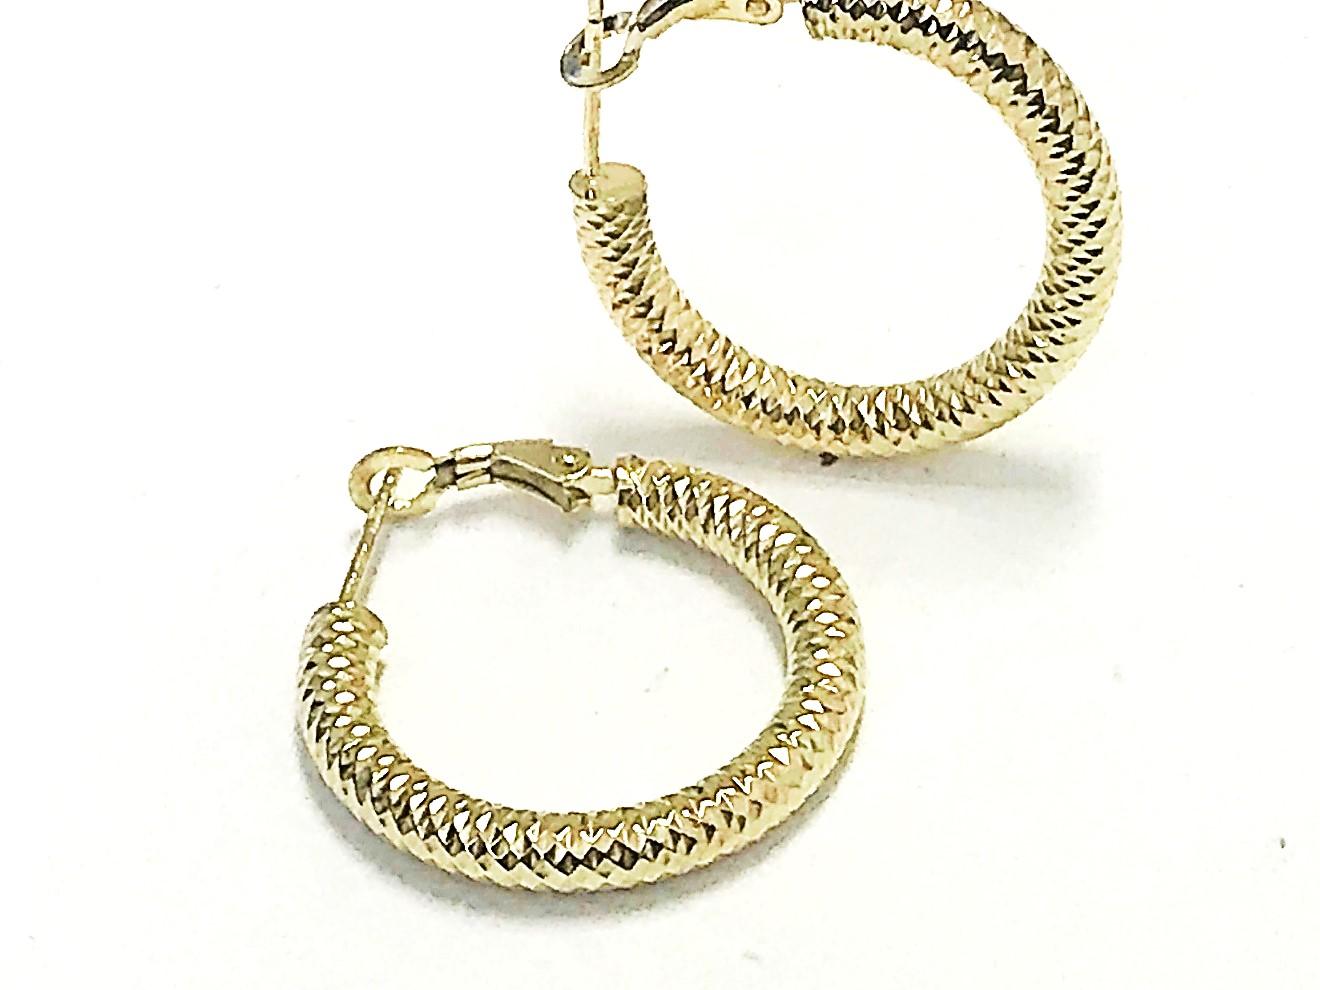 Hoop earrings for woman - 10K yellow gold